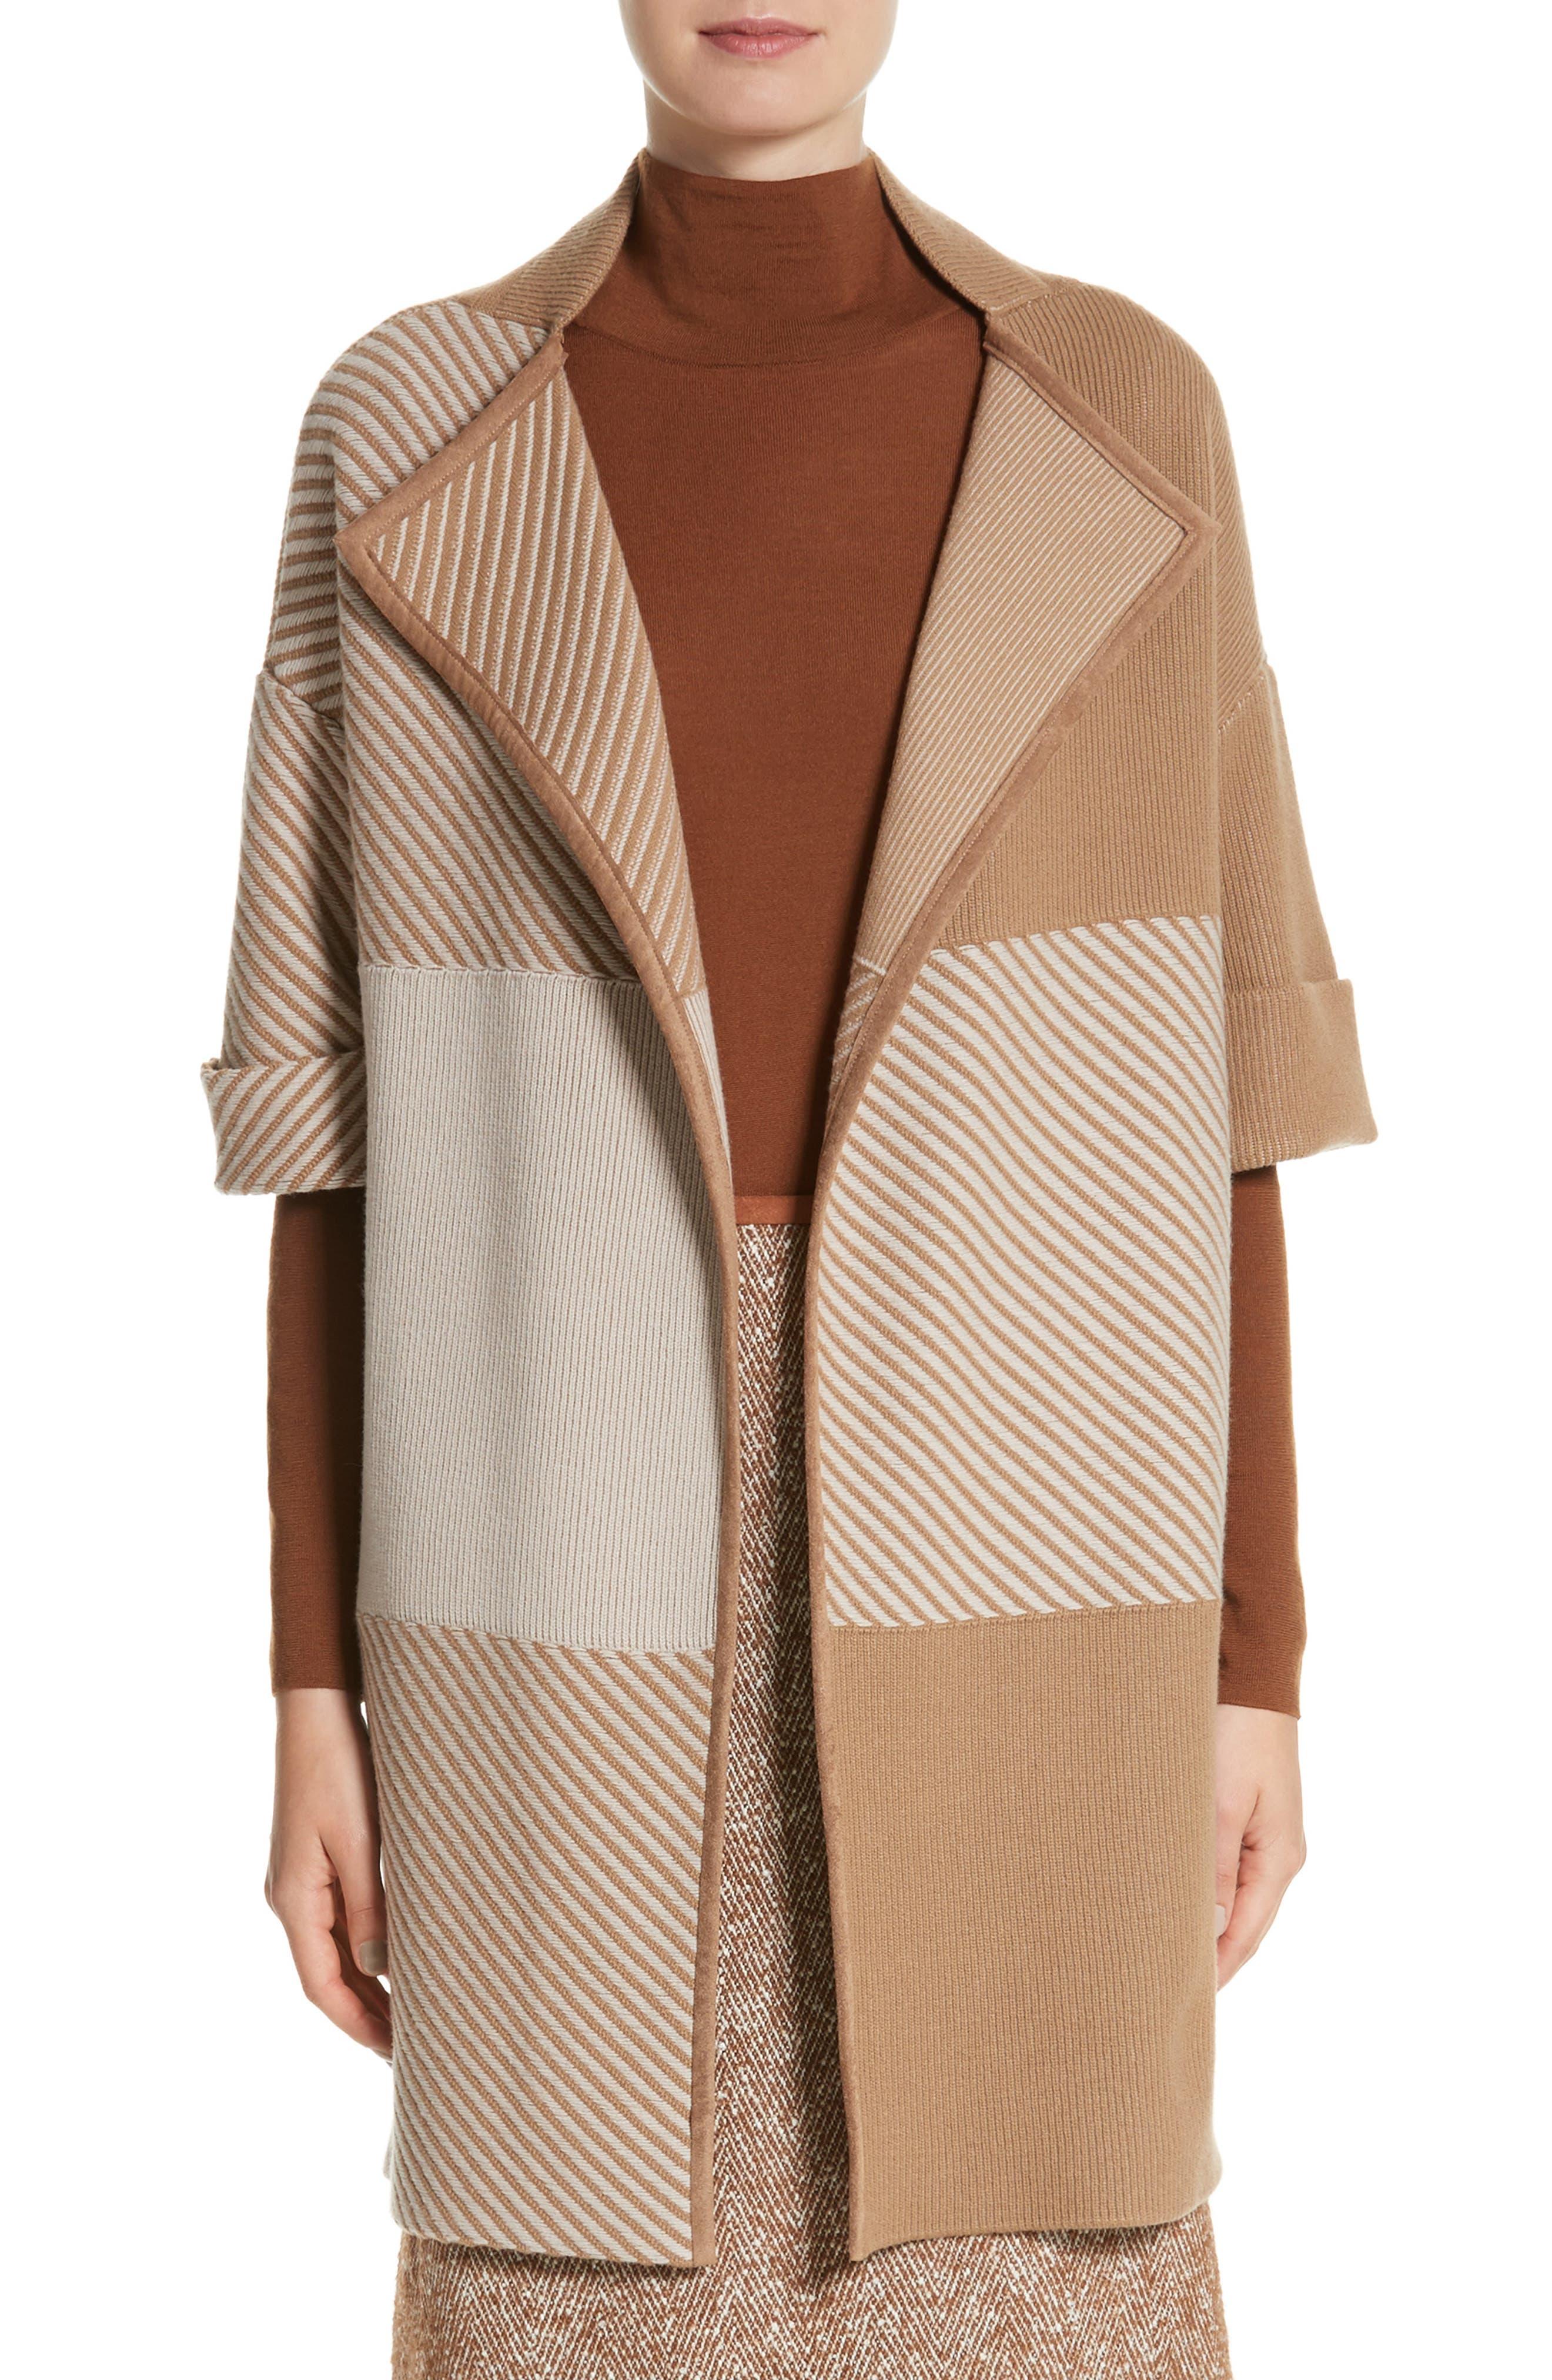 Flannel Bicolor Jacquard Coat,                         Main,                         color, 200